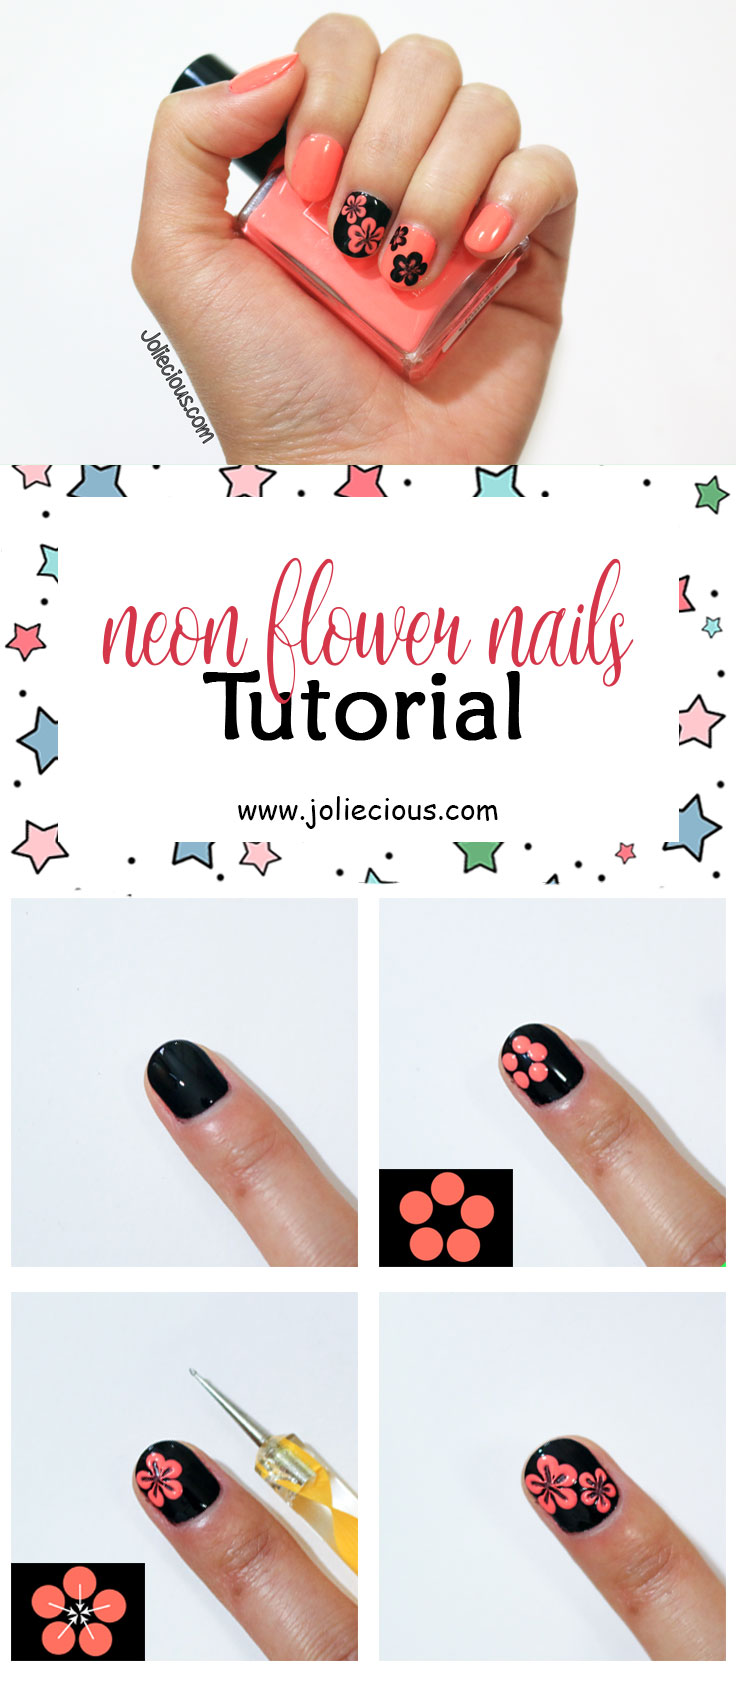 Neon flower nails tutorial